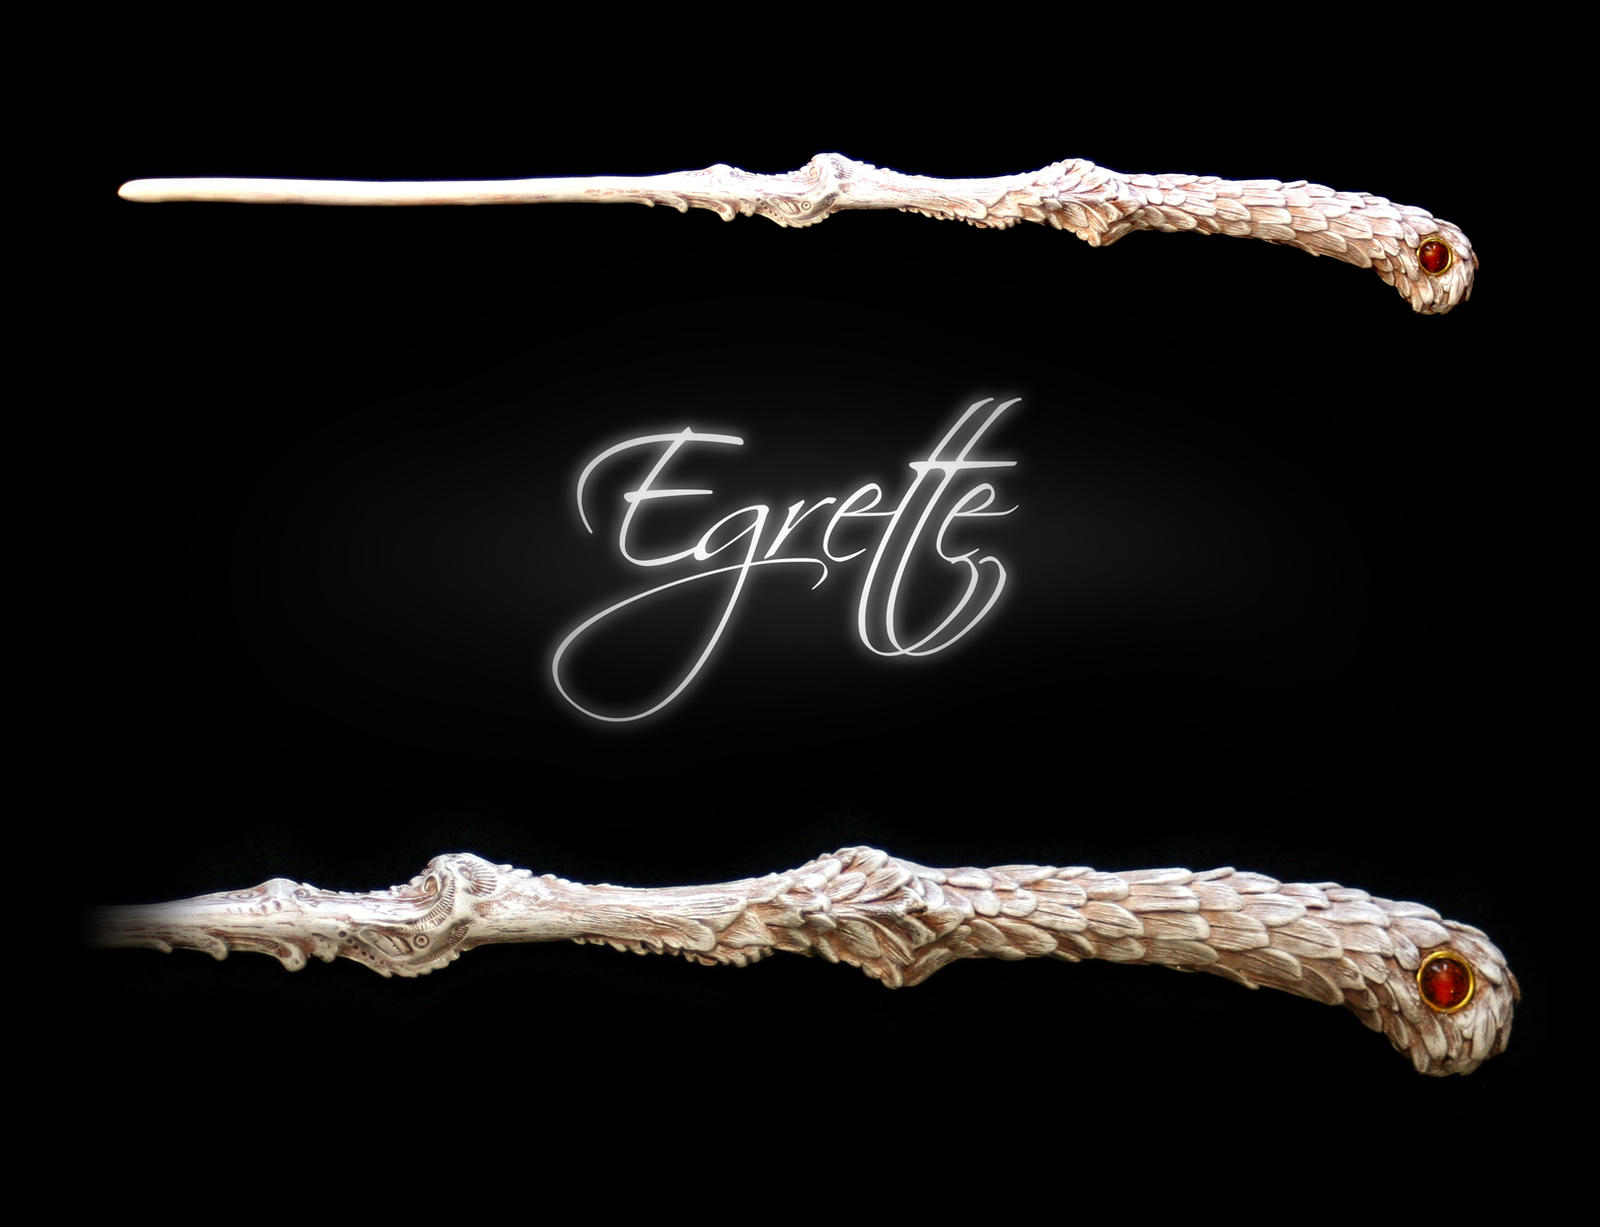 Egrette by Eclectixx